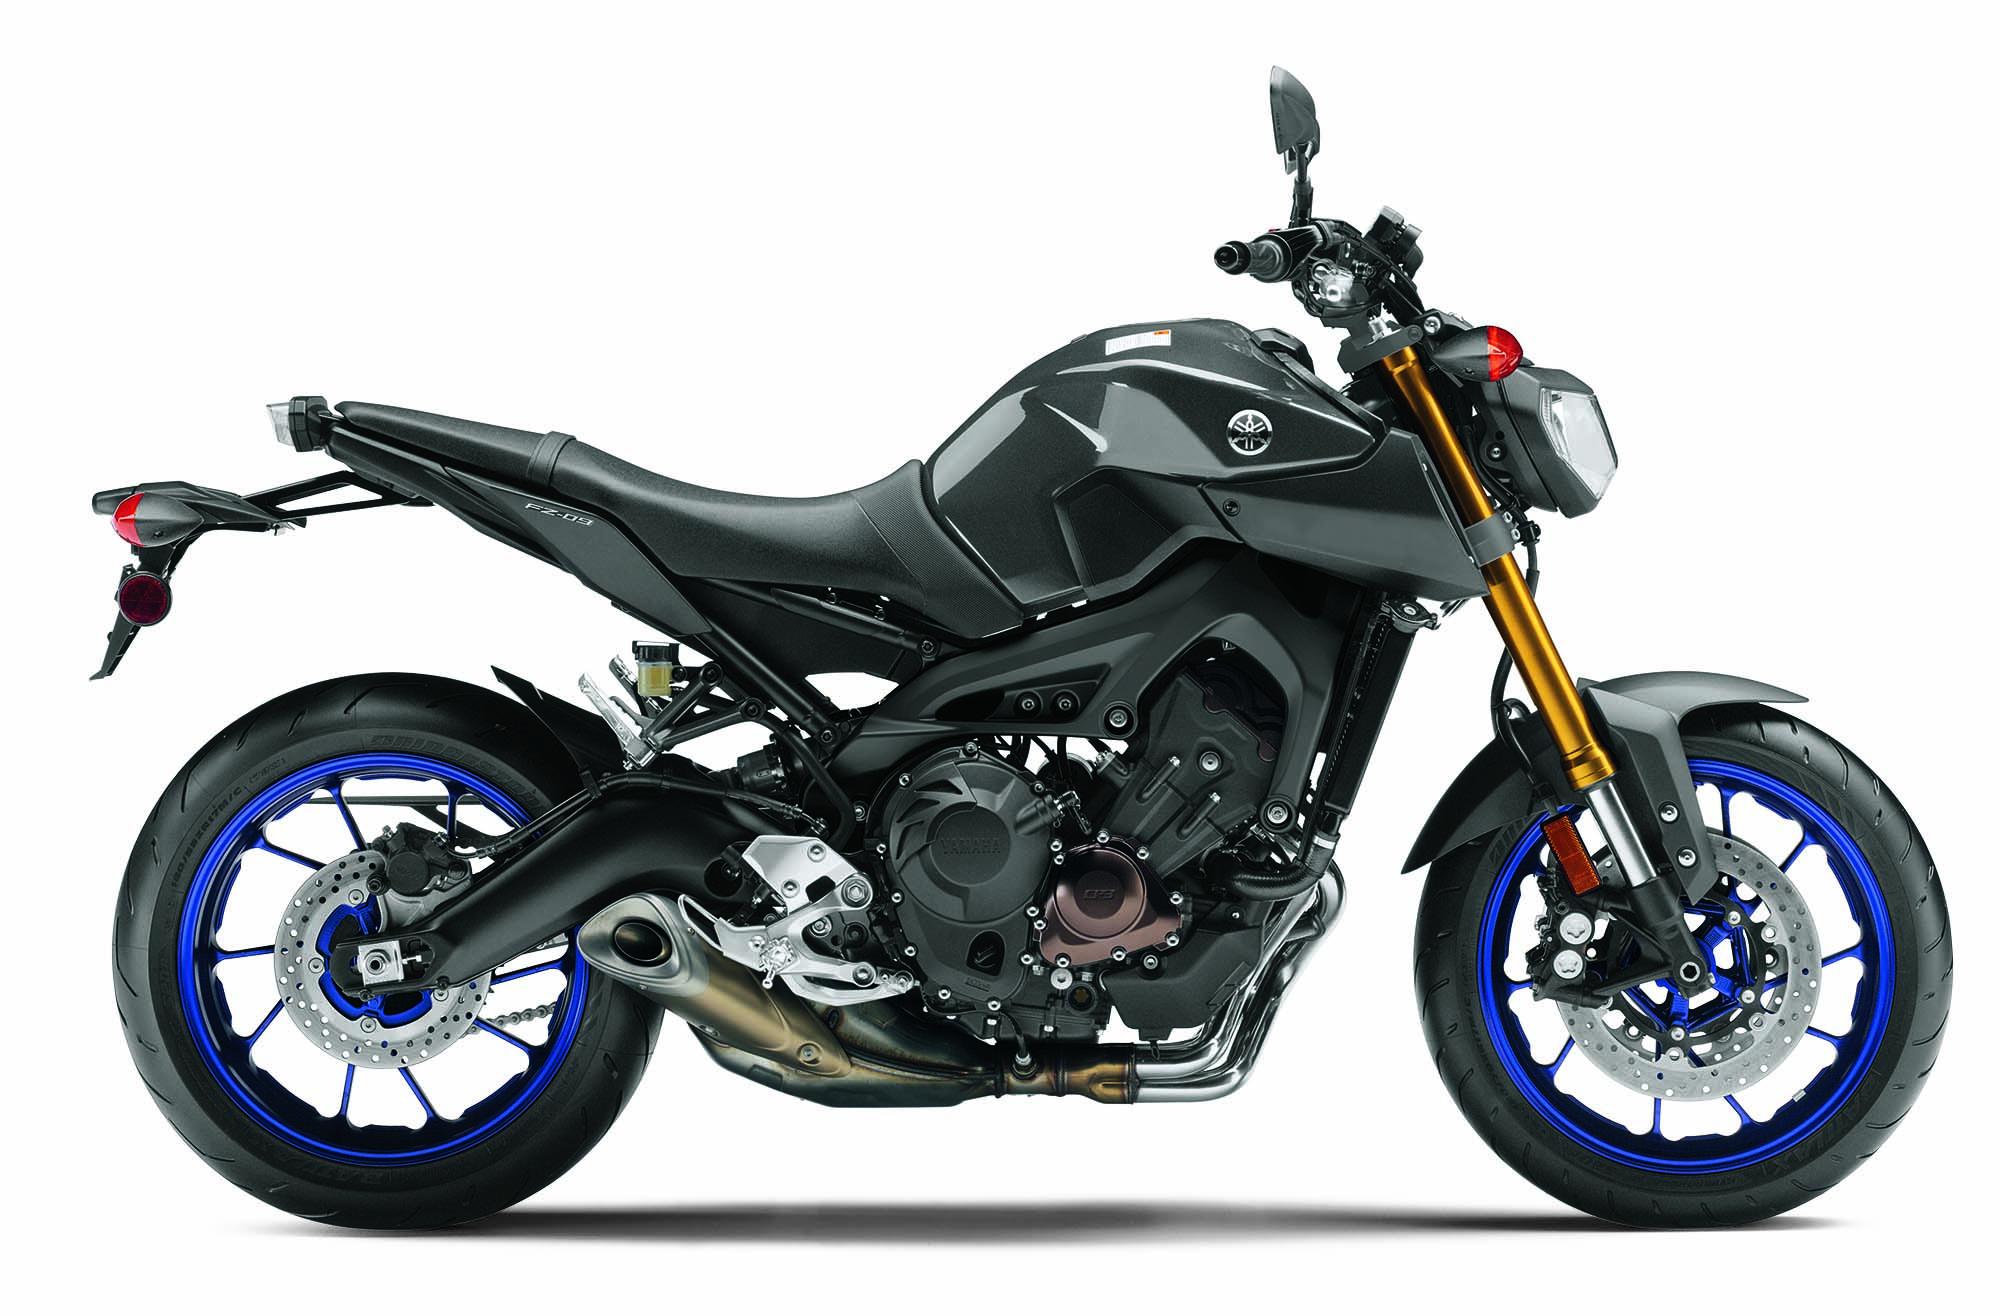 New Yamaha MT-25 naked breaks cover